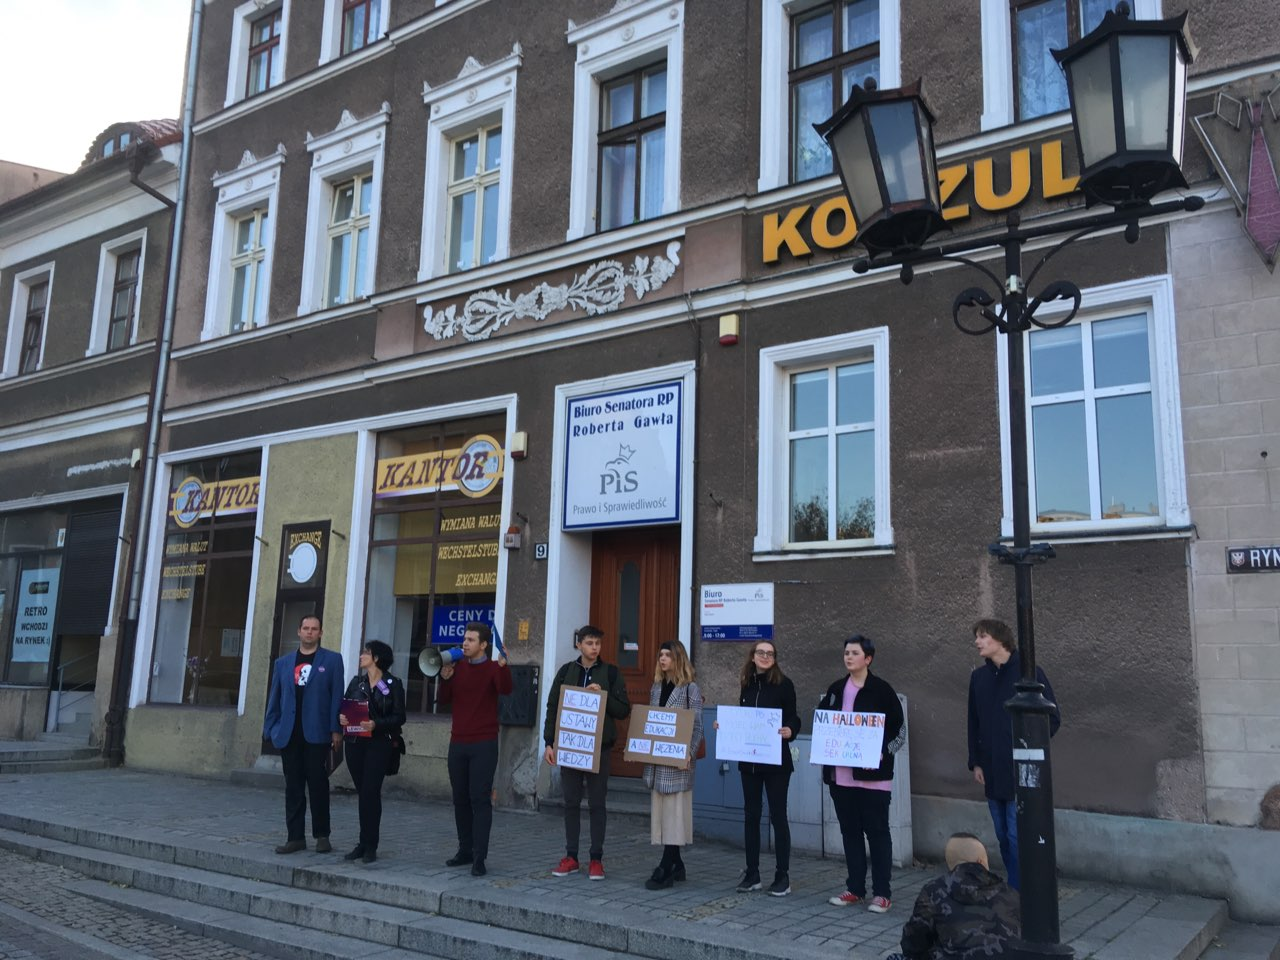 lewica protest biuro pis edukacja seksualna - Rafał Muniak